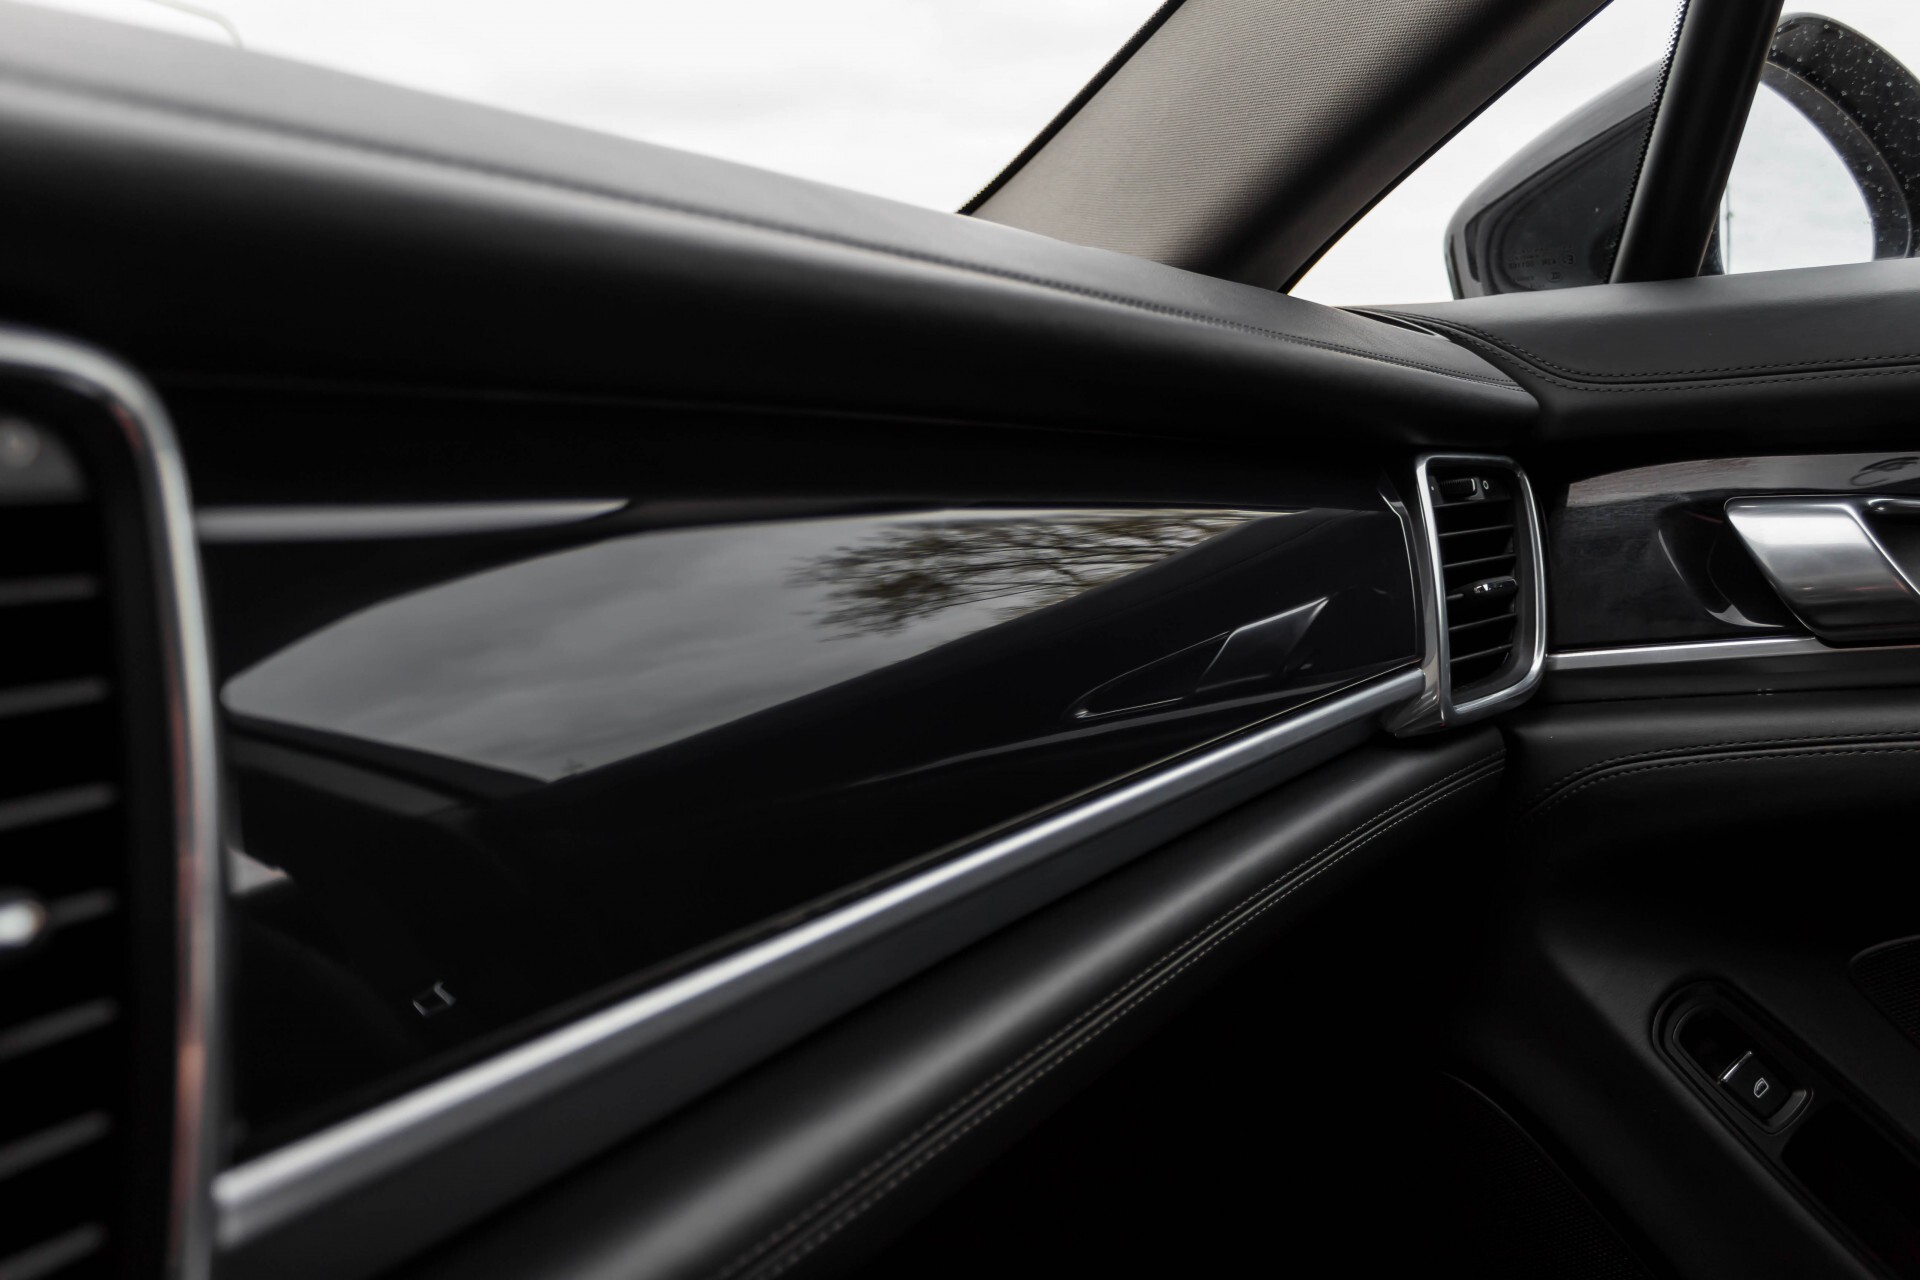 Porsche Panamera 3.6 4 Sportchrono/Luchtvering/Dak/Nappa/Aut7 Foto 29